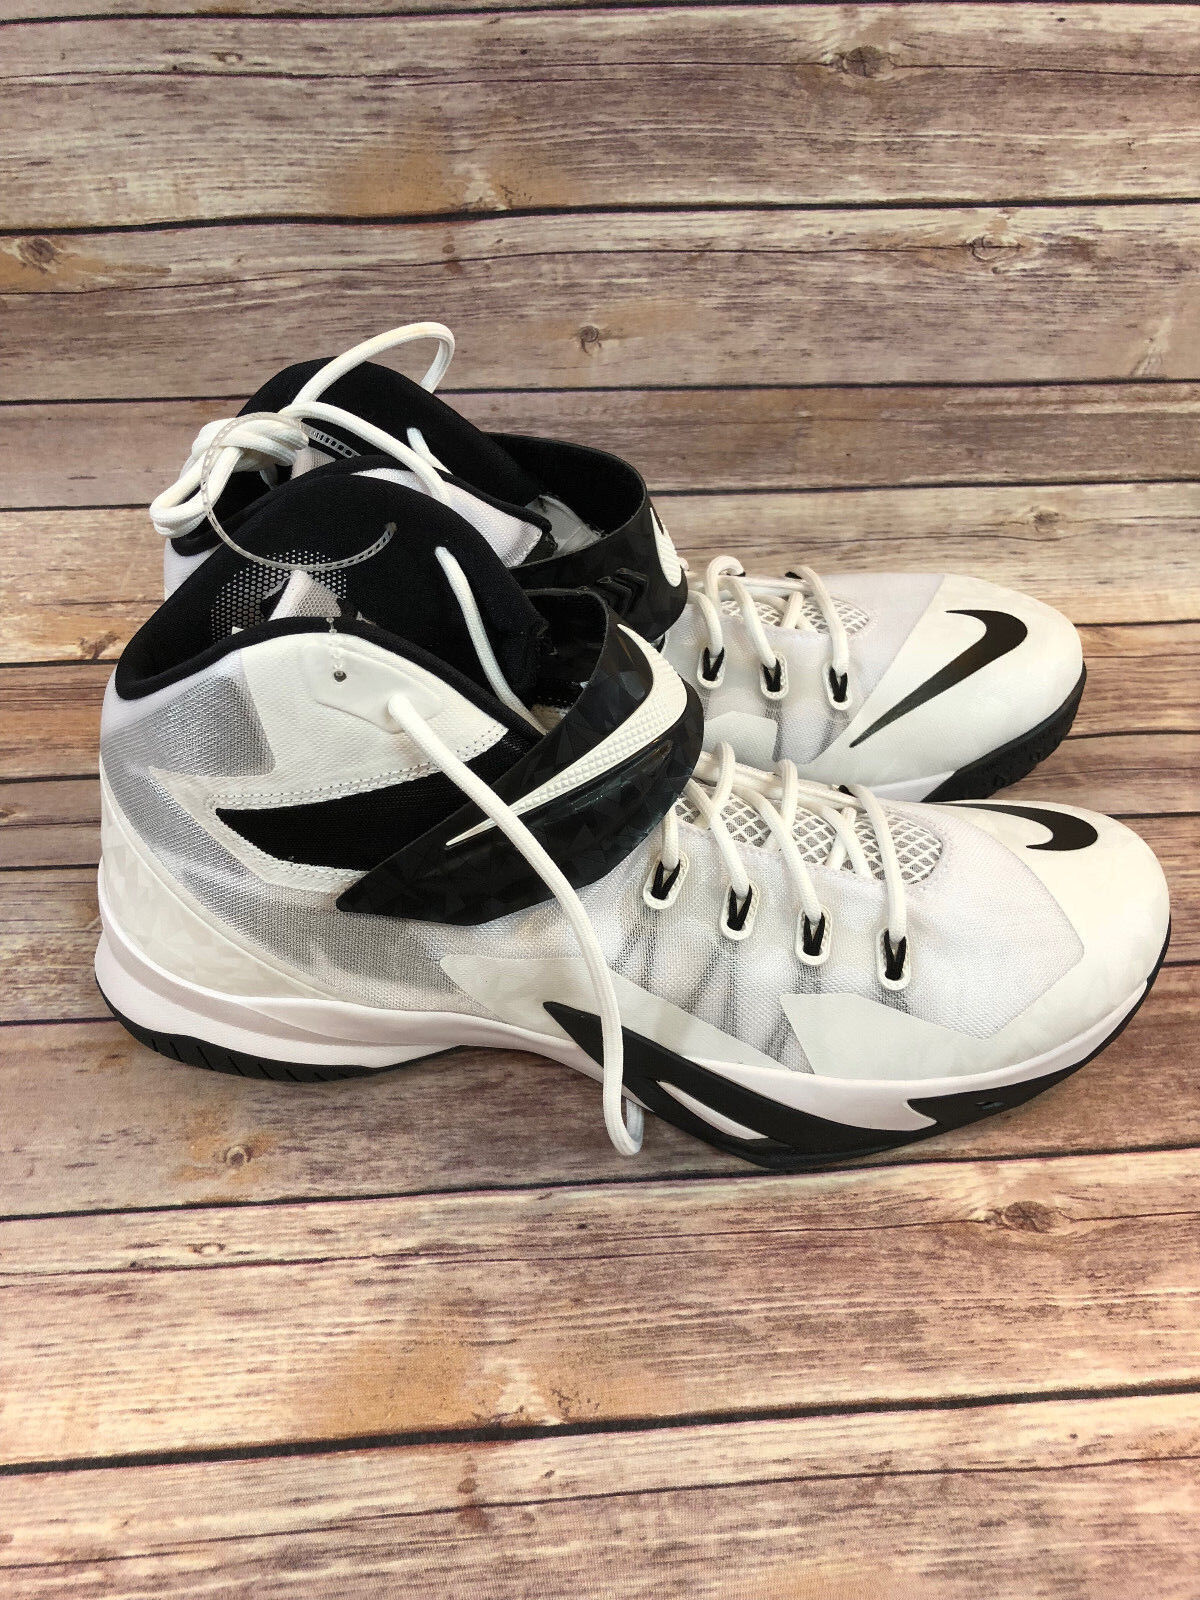 nike 653648-100 lebron zoom soldat 8 Blanc Blanc 8  & Noir  baskets taille 18 c3613b